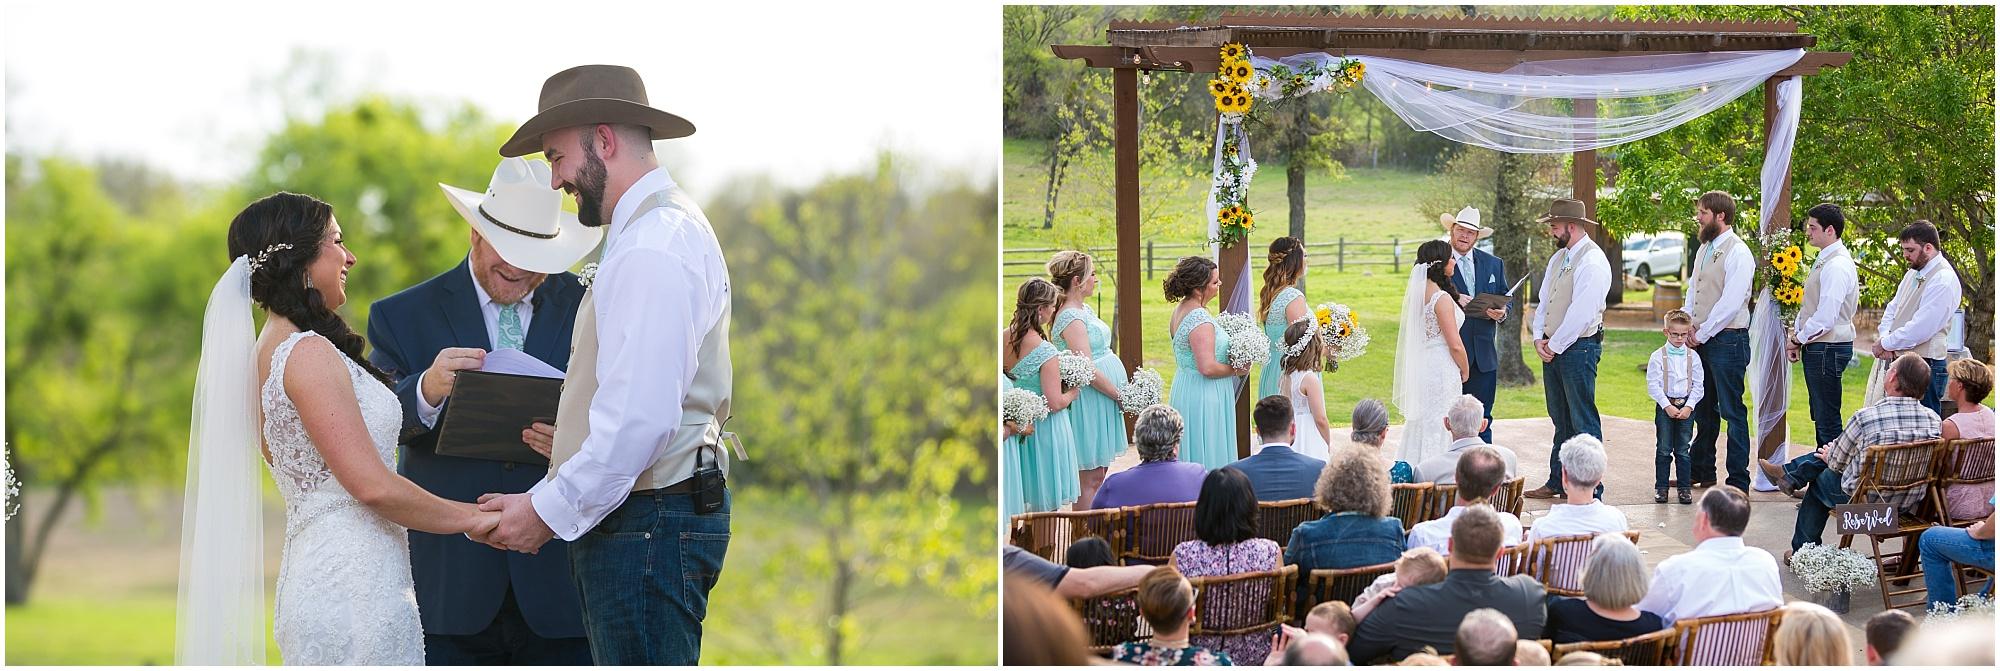 Rustic wedding at Peacock River Ranch - Jason & Melaina Photography - www.jasonandmelaina.com